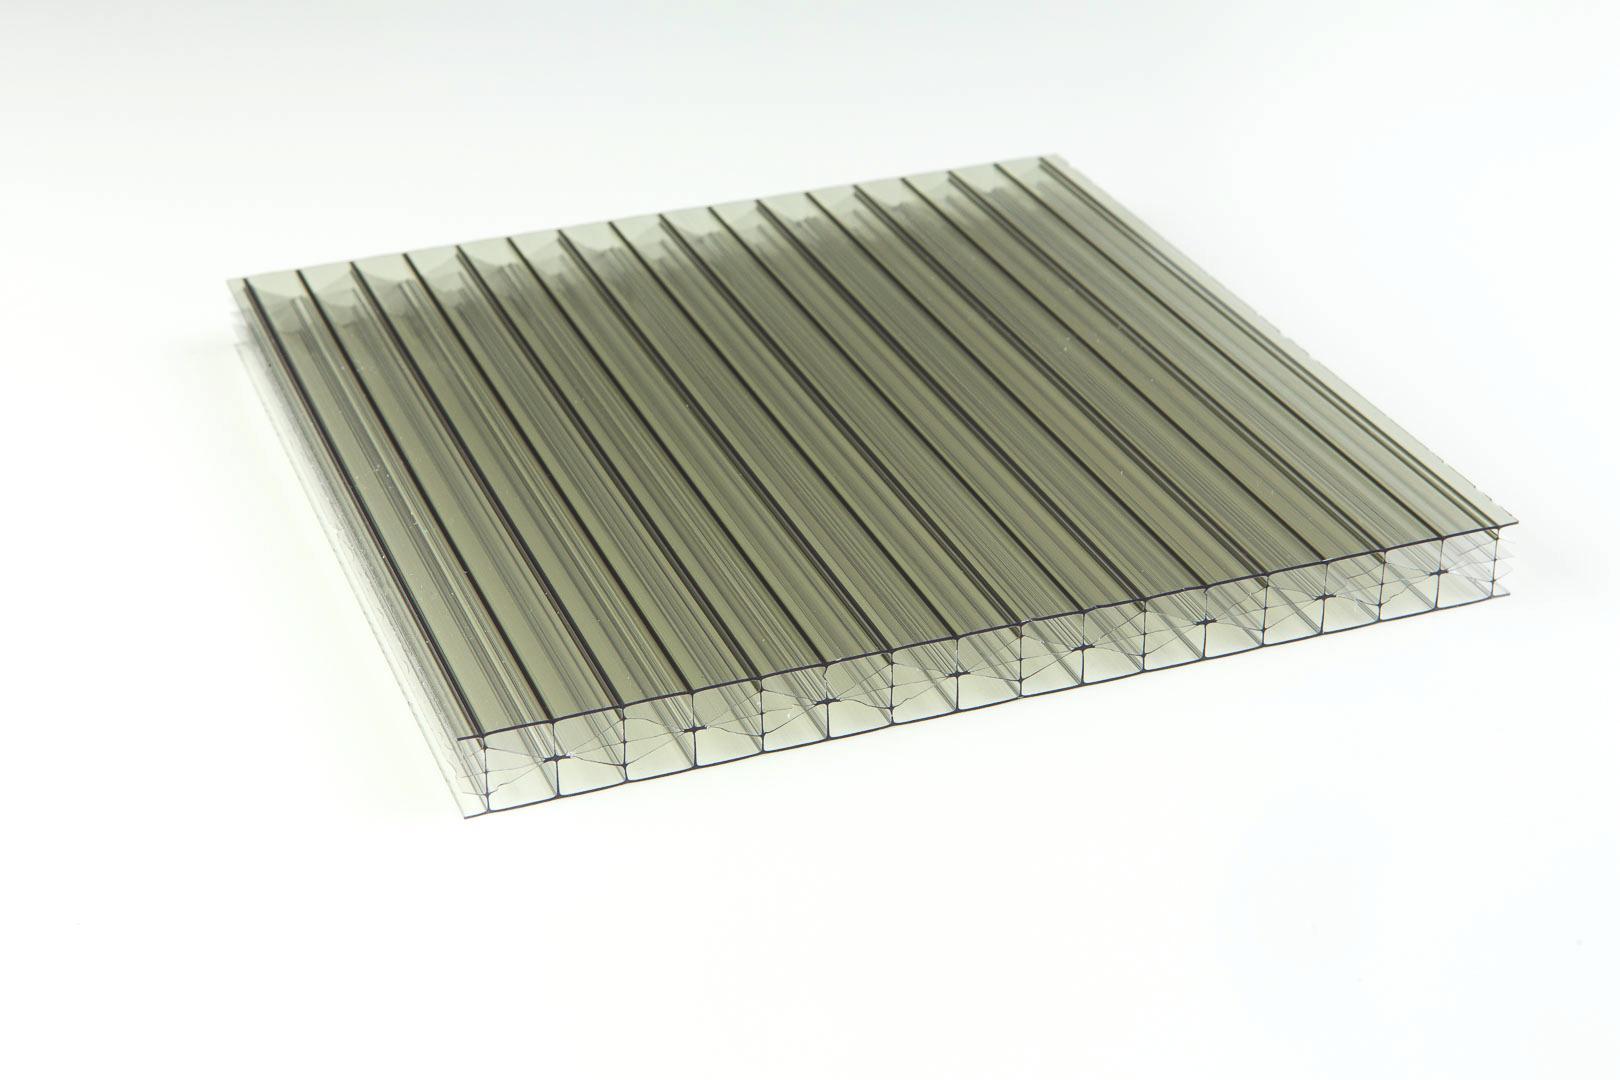 Polycarbonat 16mm Heatblock Primalite klar